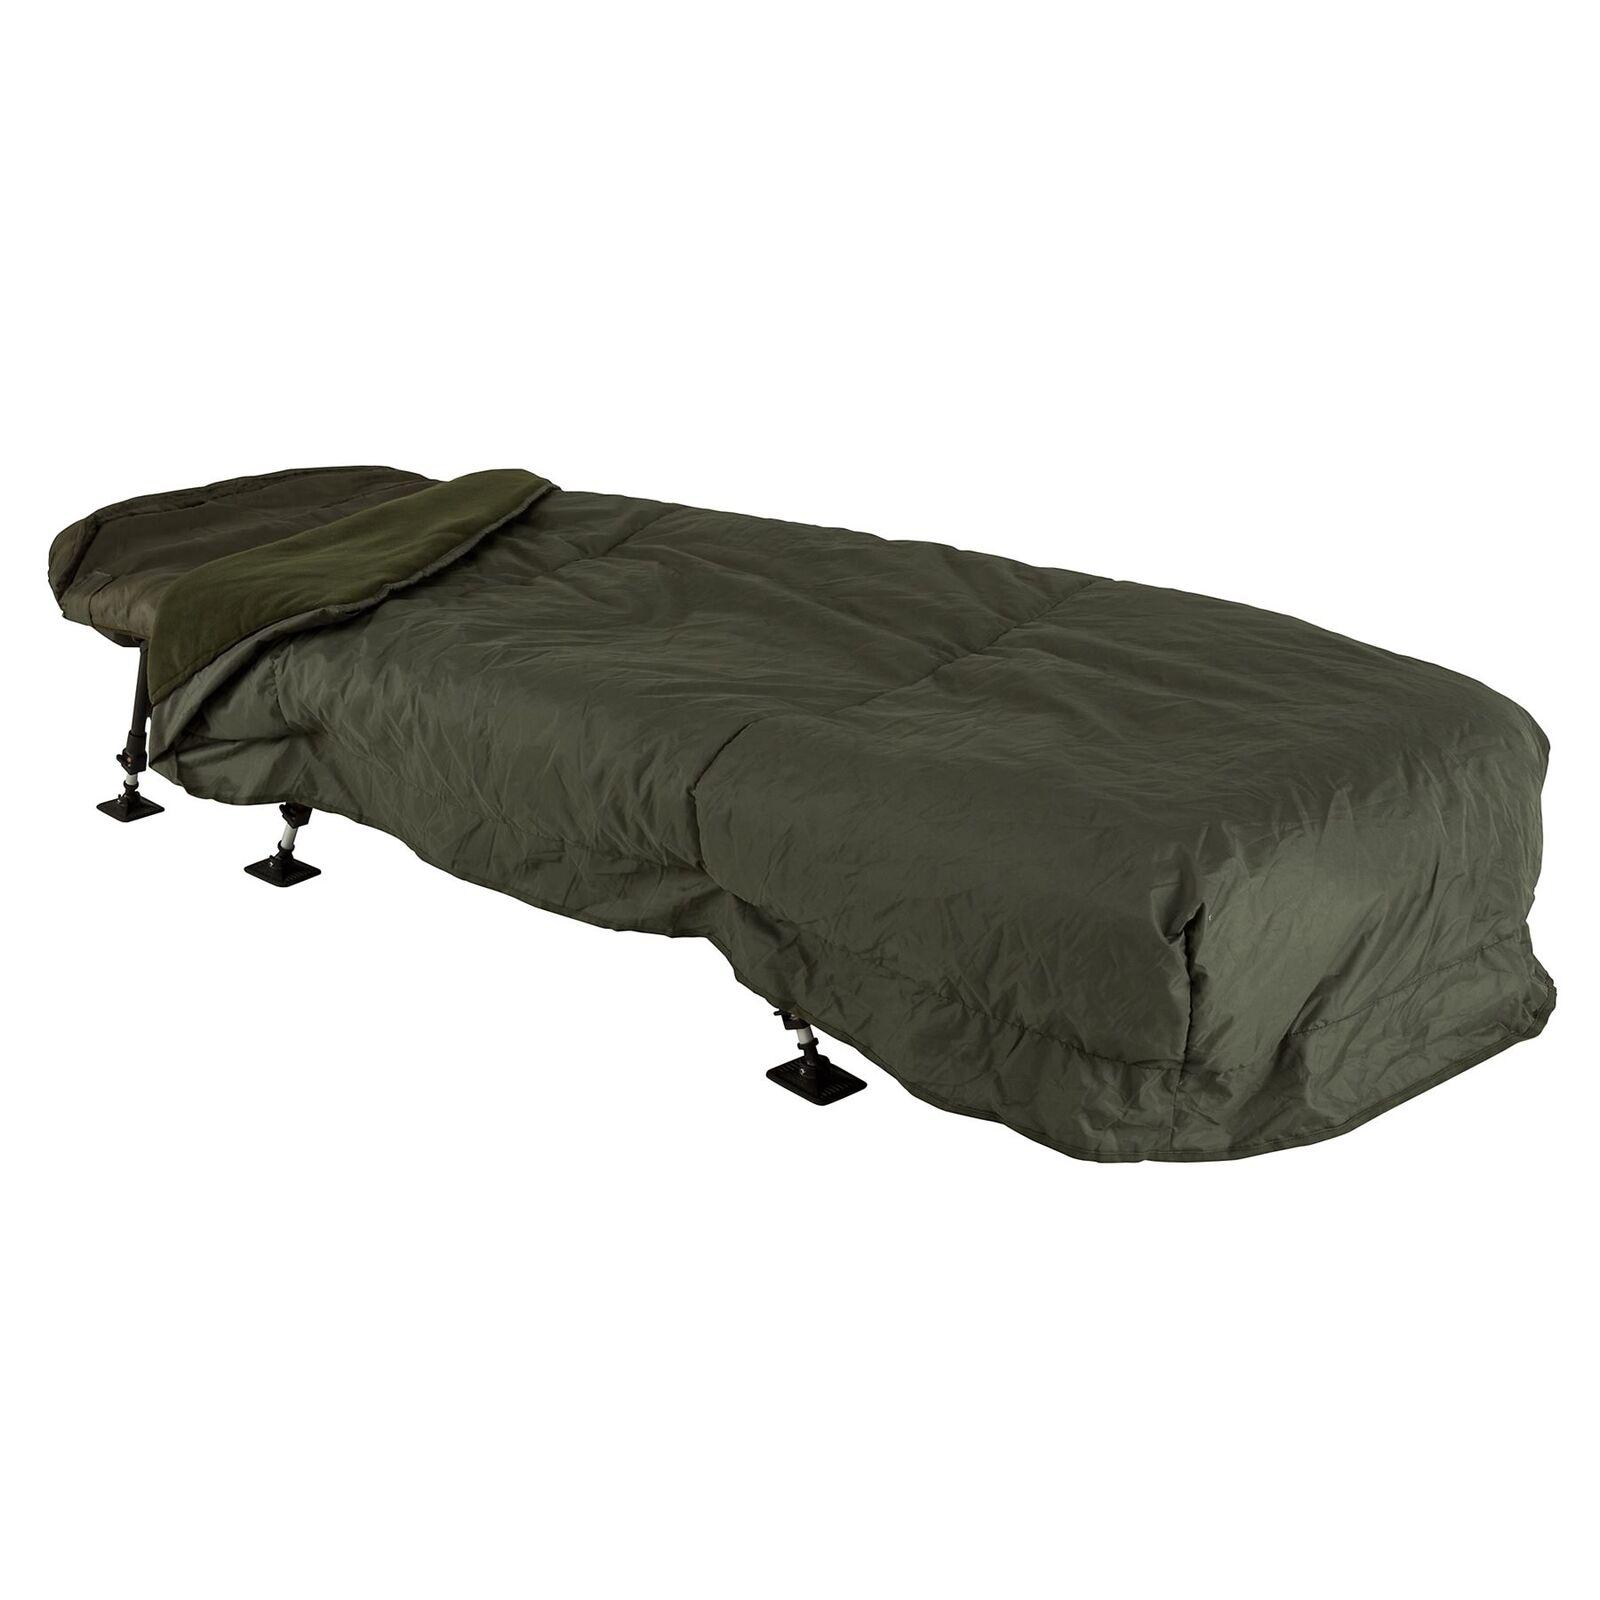 JRC Defender Sleeping Bag & Cover Combo   Carp Fishing